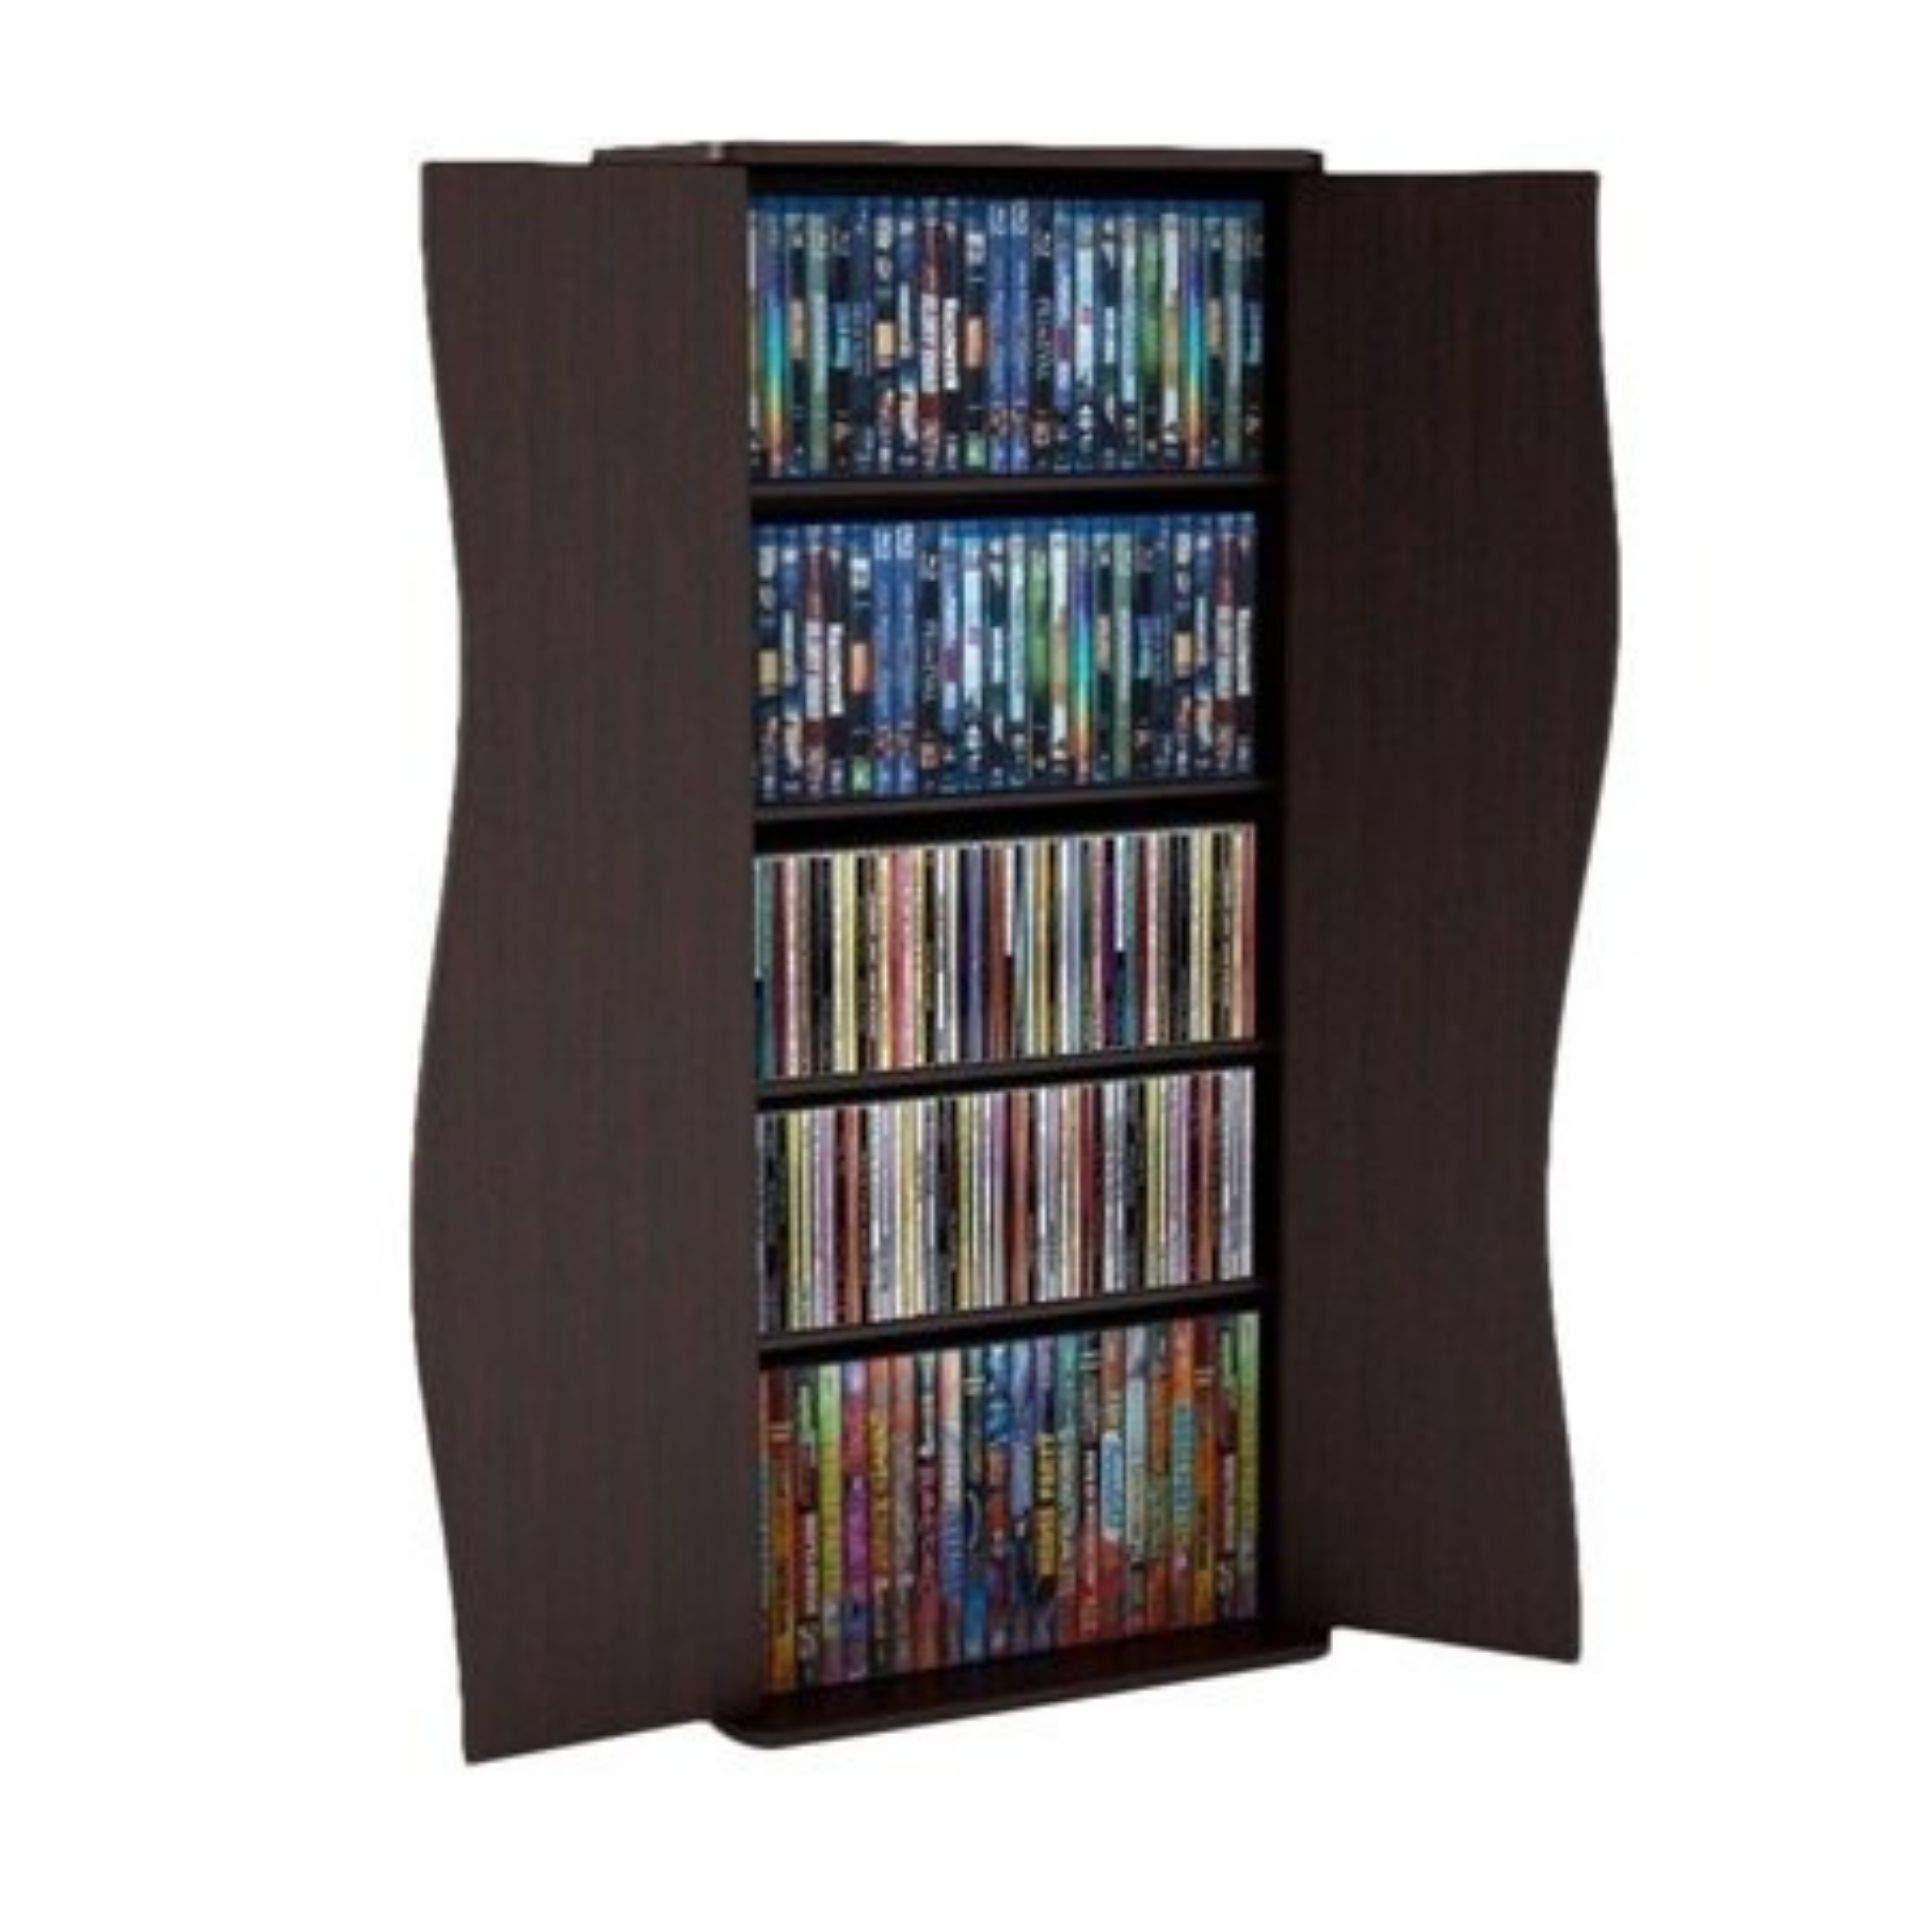 Atlantic 35'' Venus Small Media Storage Shelf & Cabinet (198 CDs, 88 DVDs, 180 BluRays), Espresso by Atlantic